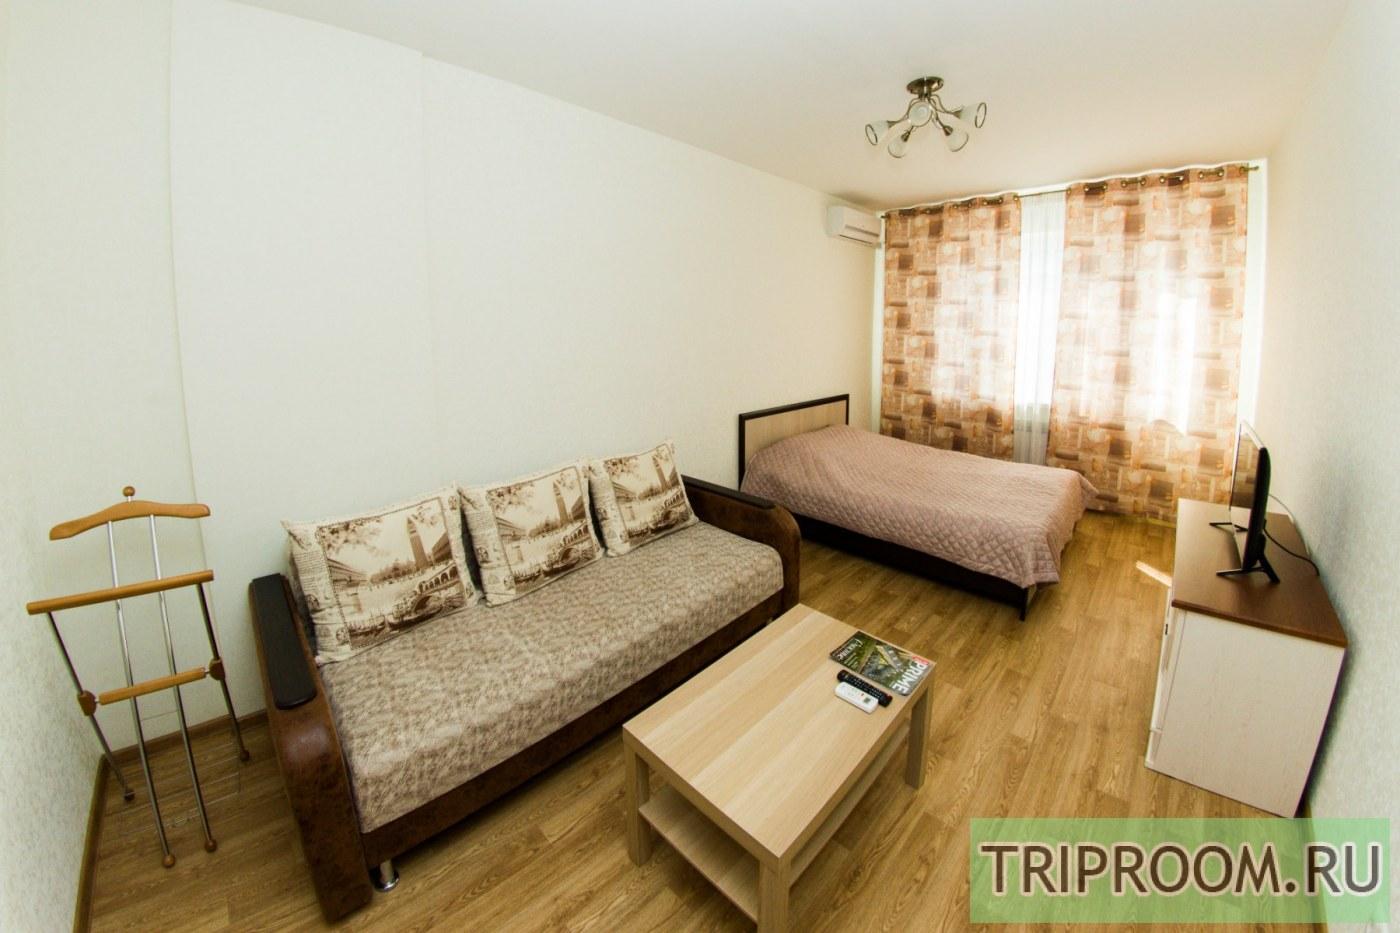 1-комнатная квартира посуточно (вариант № 39814), ул. Ленинский проспект, фото № 2